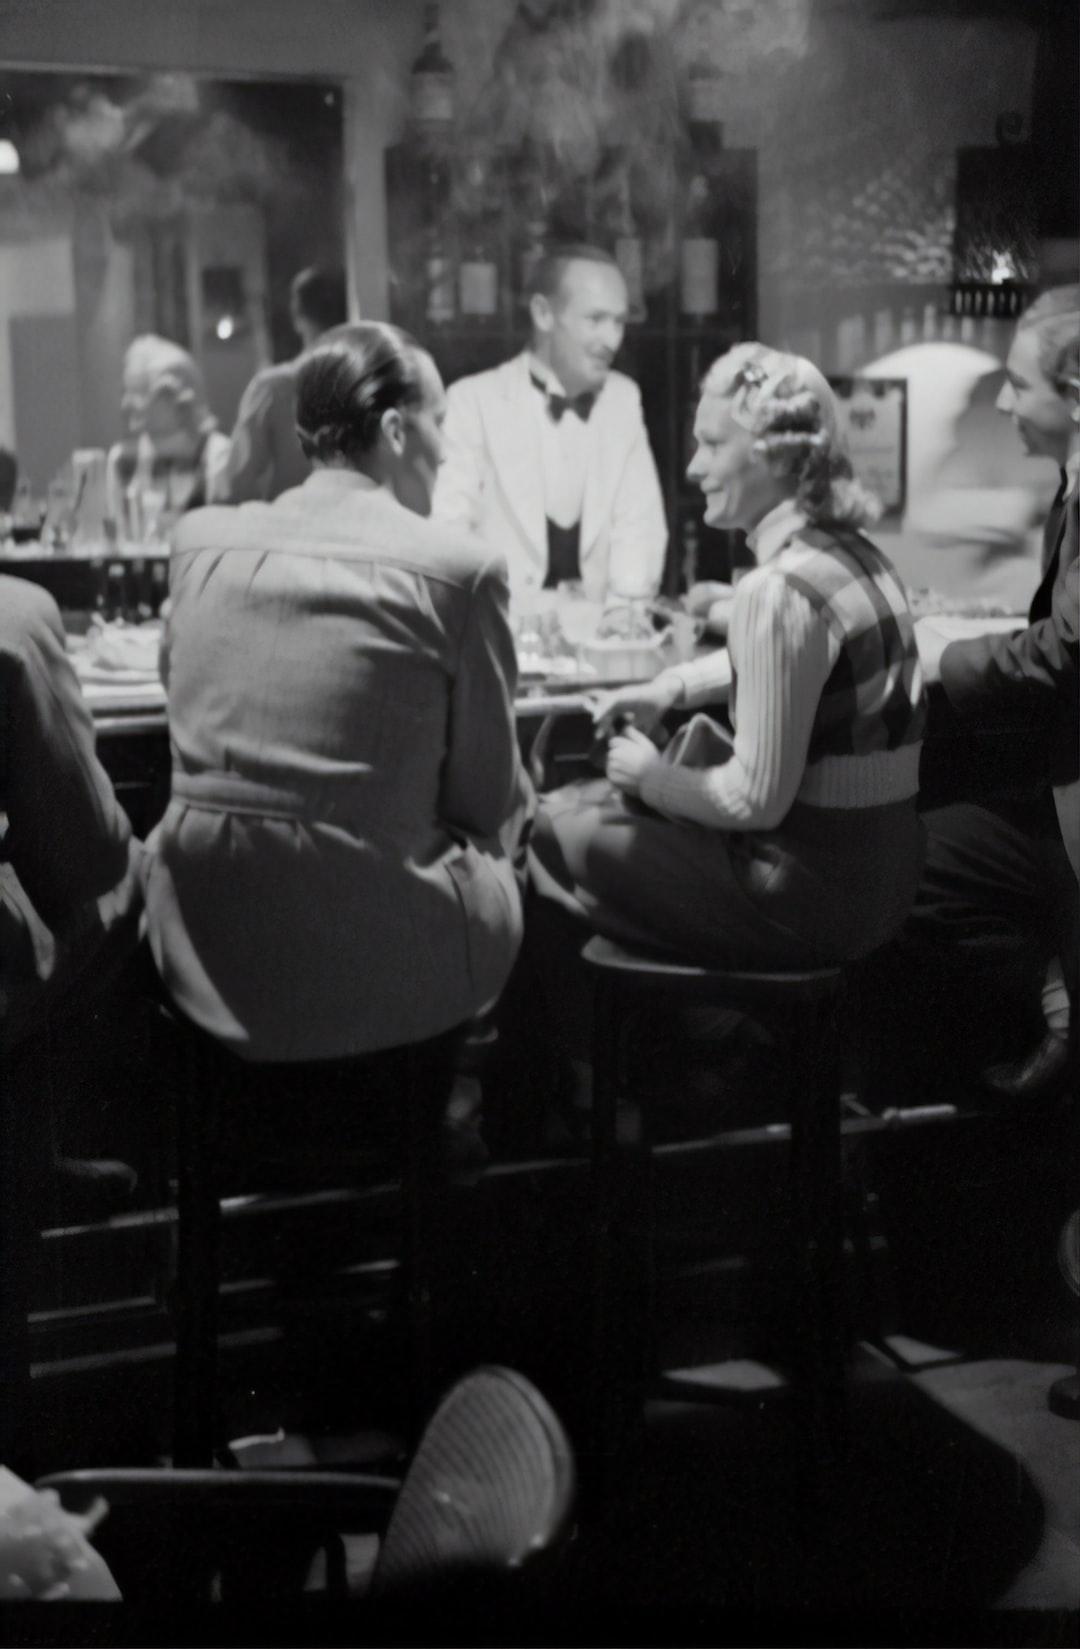 Apres ski at the bar, 1940